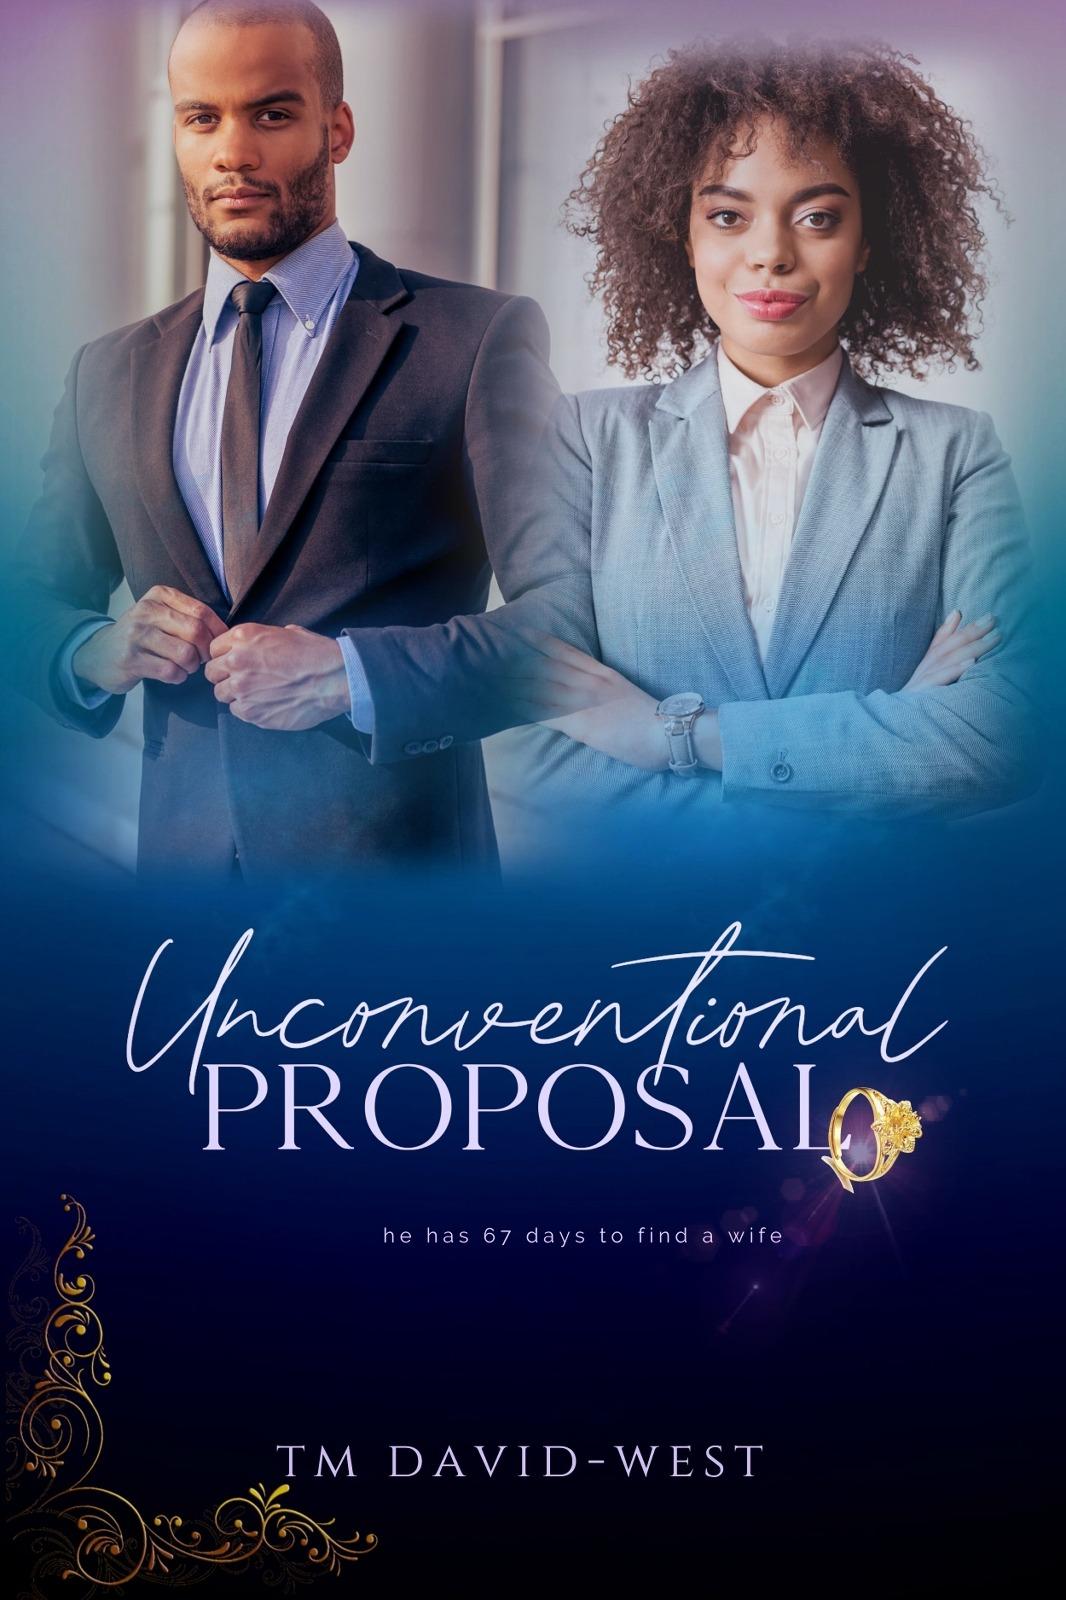 Unconventional Proposal